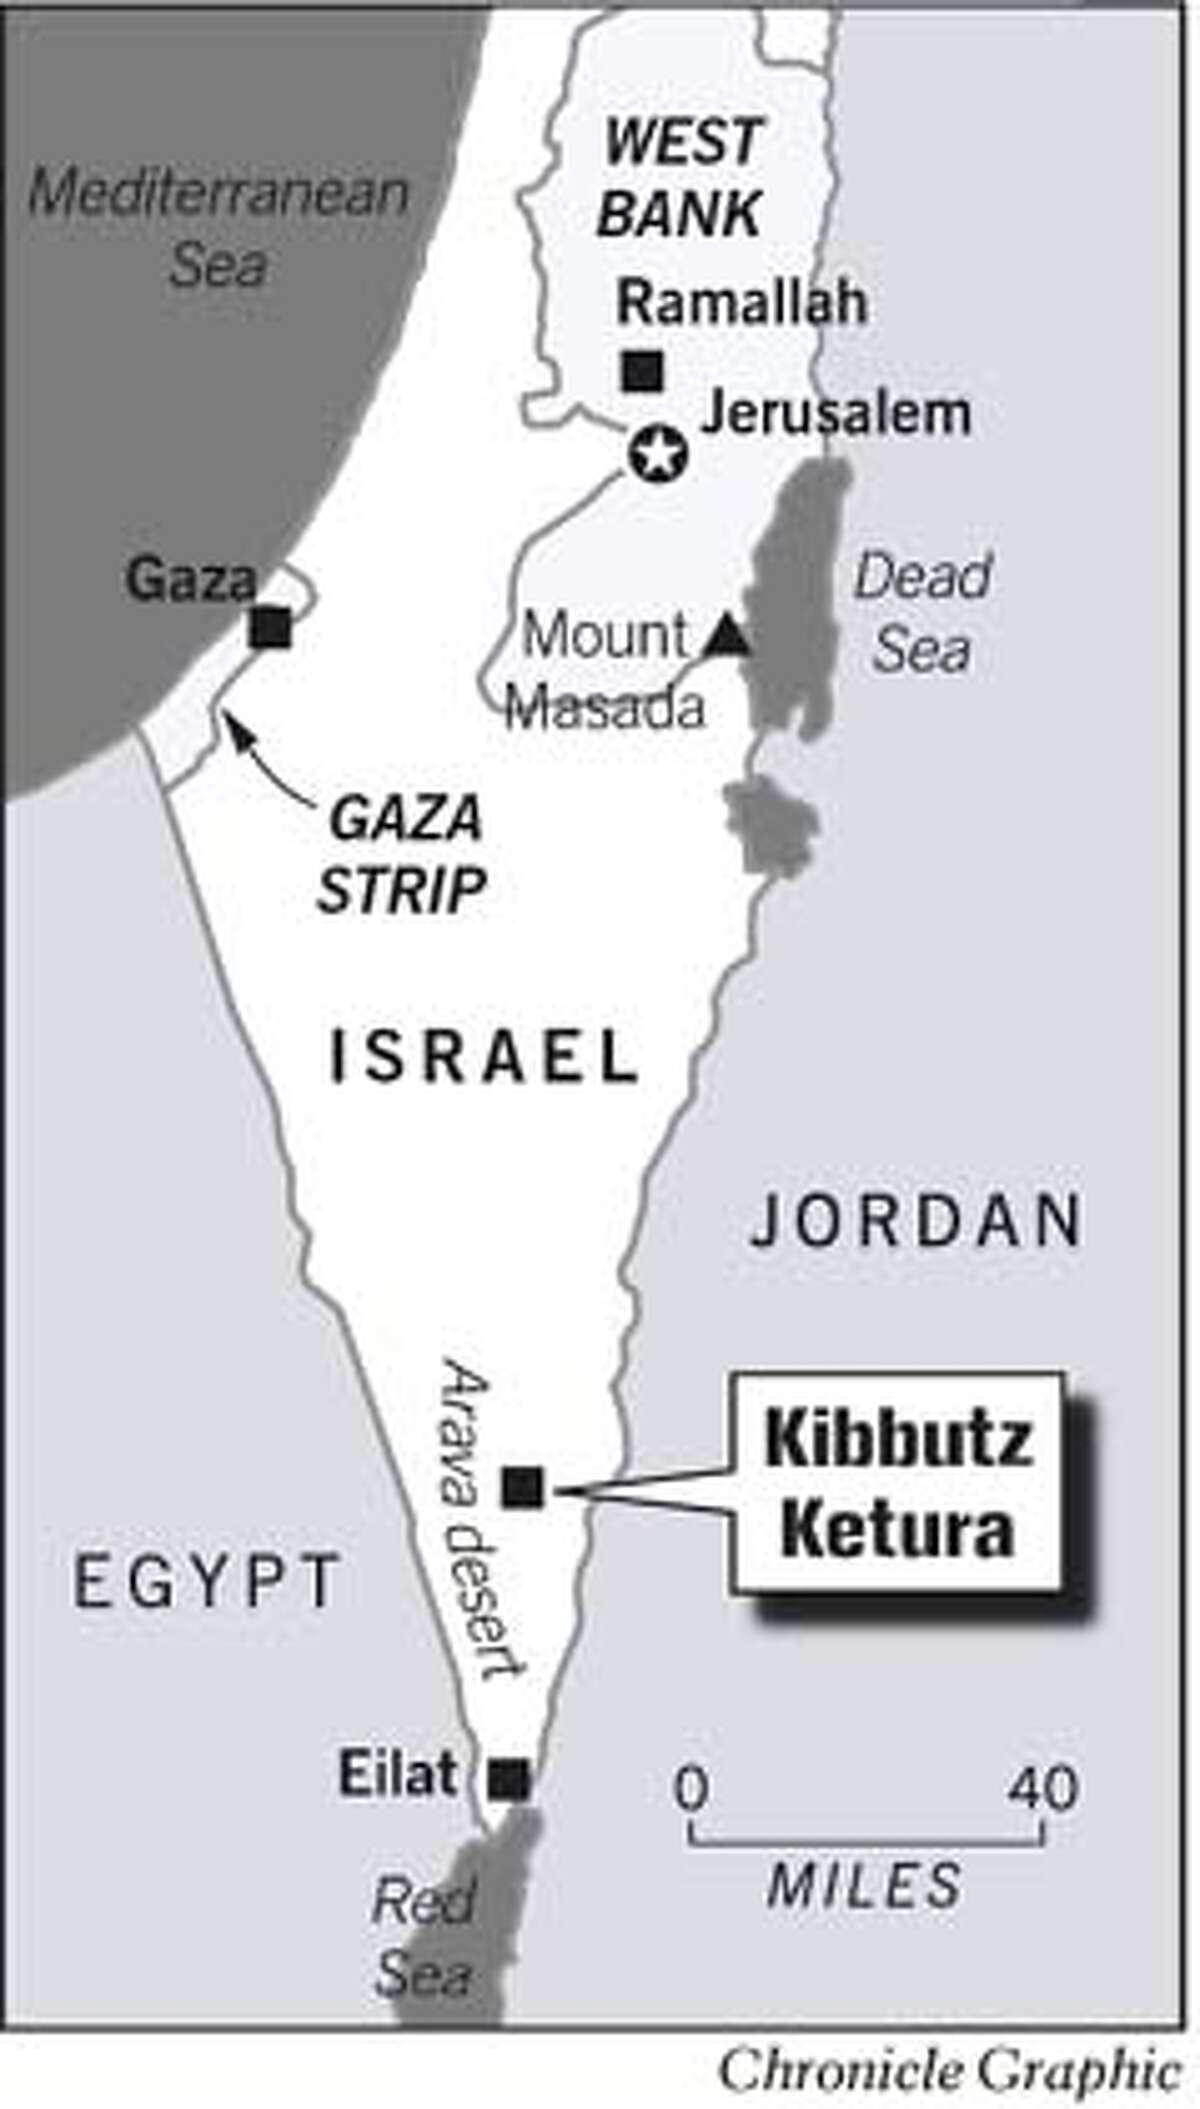 Kibbutz Ketura, Israel. Chronicle Graphic